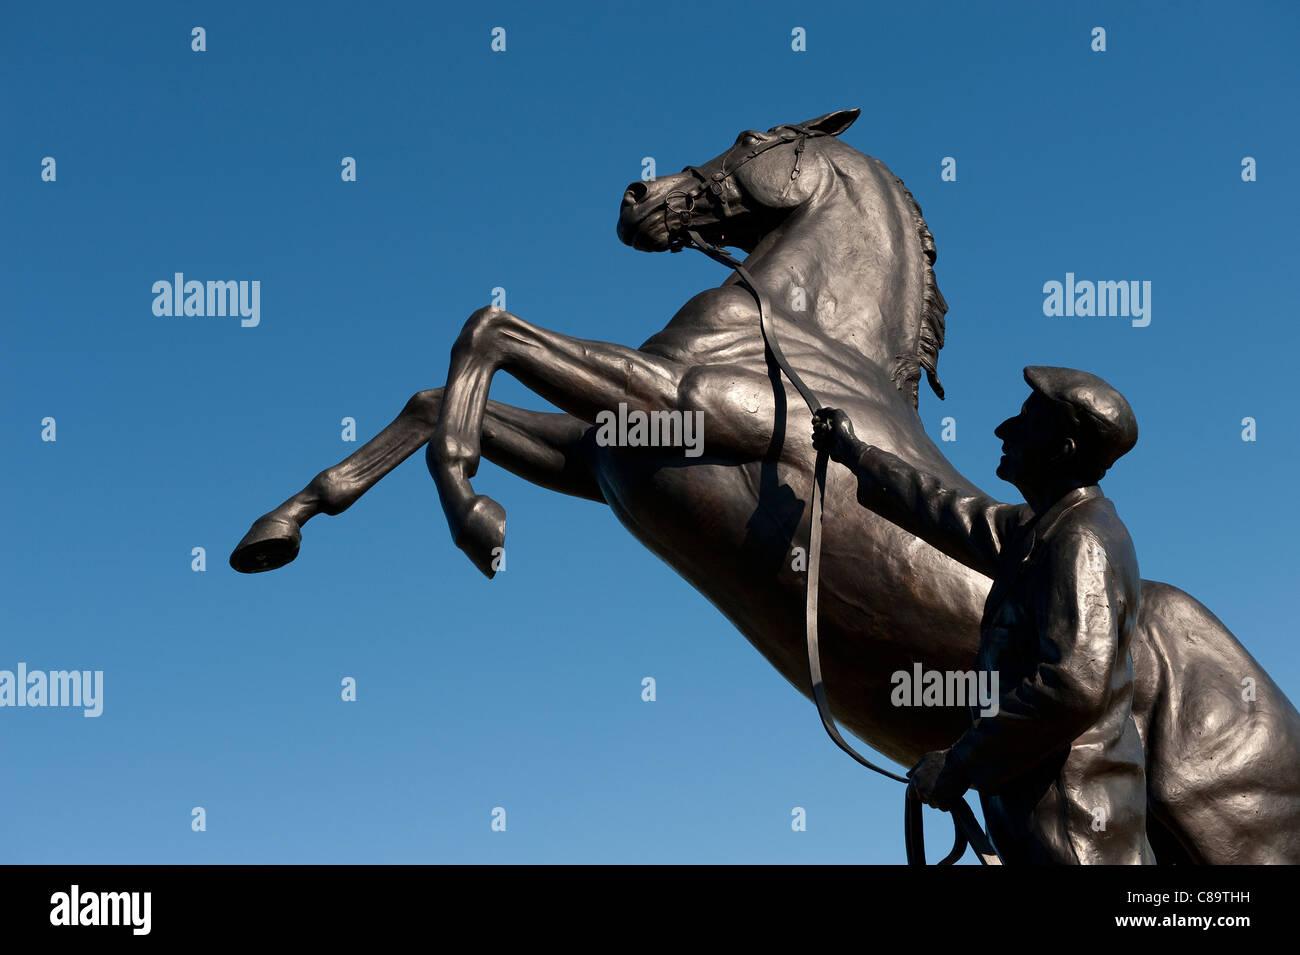 the newmarket stallion, suffolk, england - Stock Image